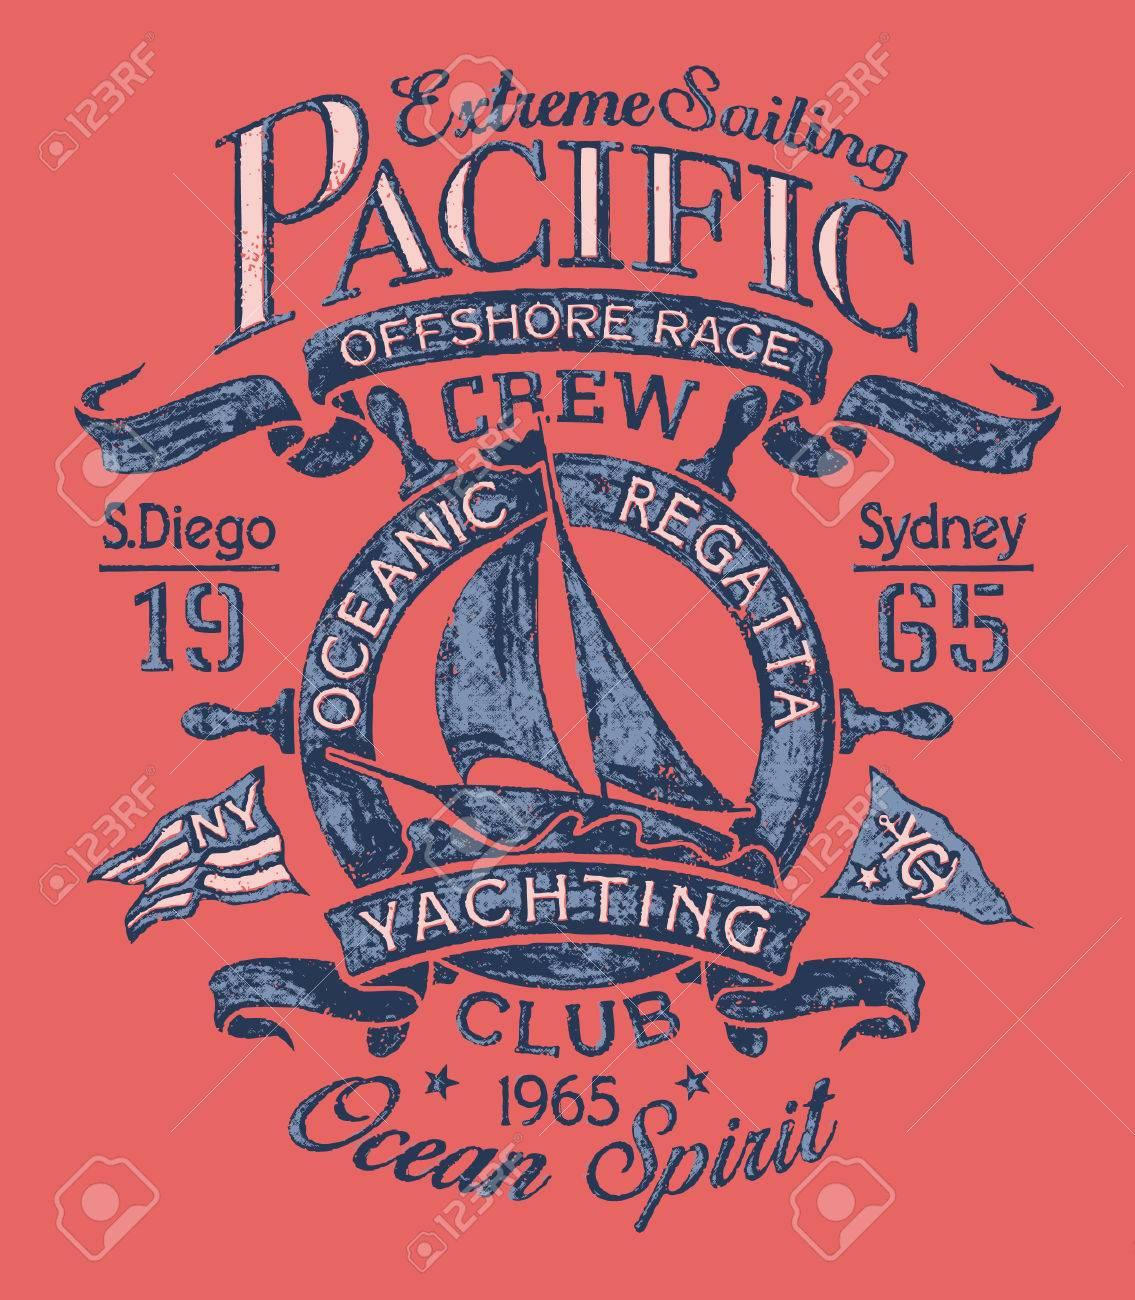 Extreme Sailing Regatta Vector Artwork For T Shirt Print In